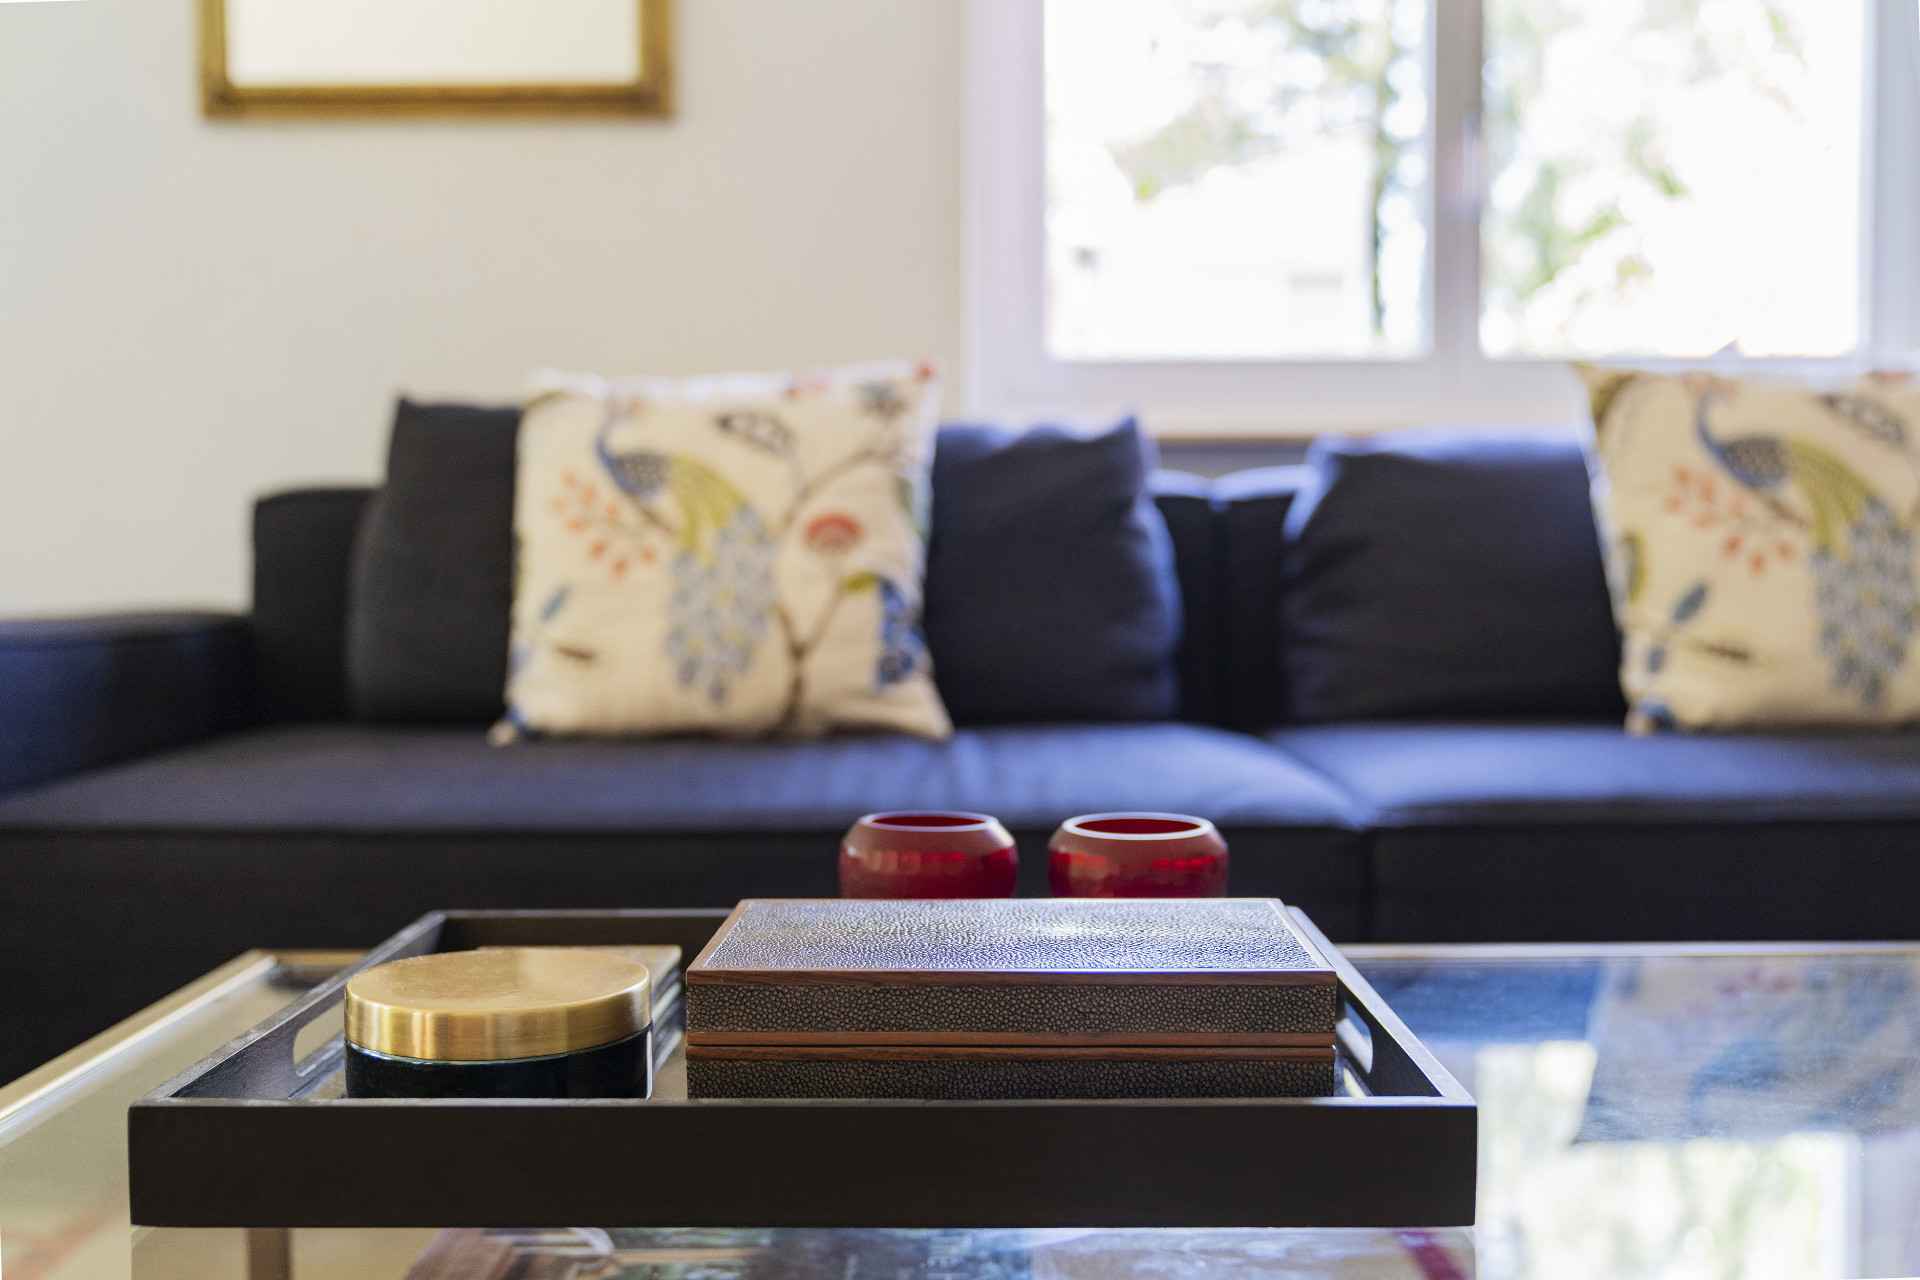 luxury decor and elegant embroidery